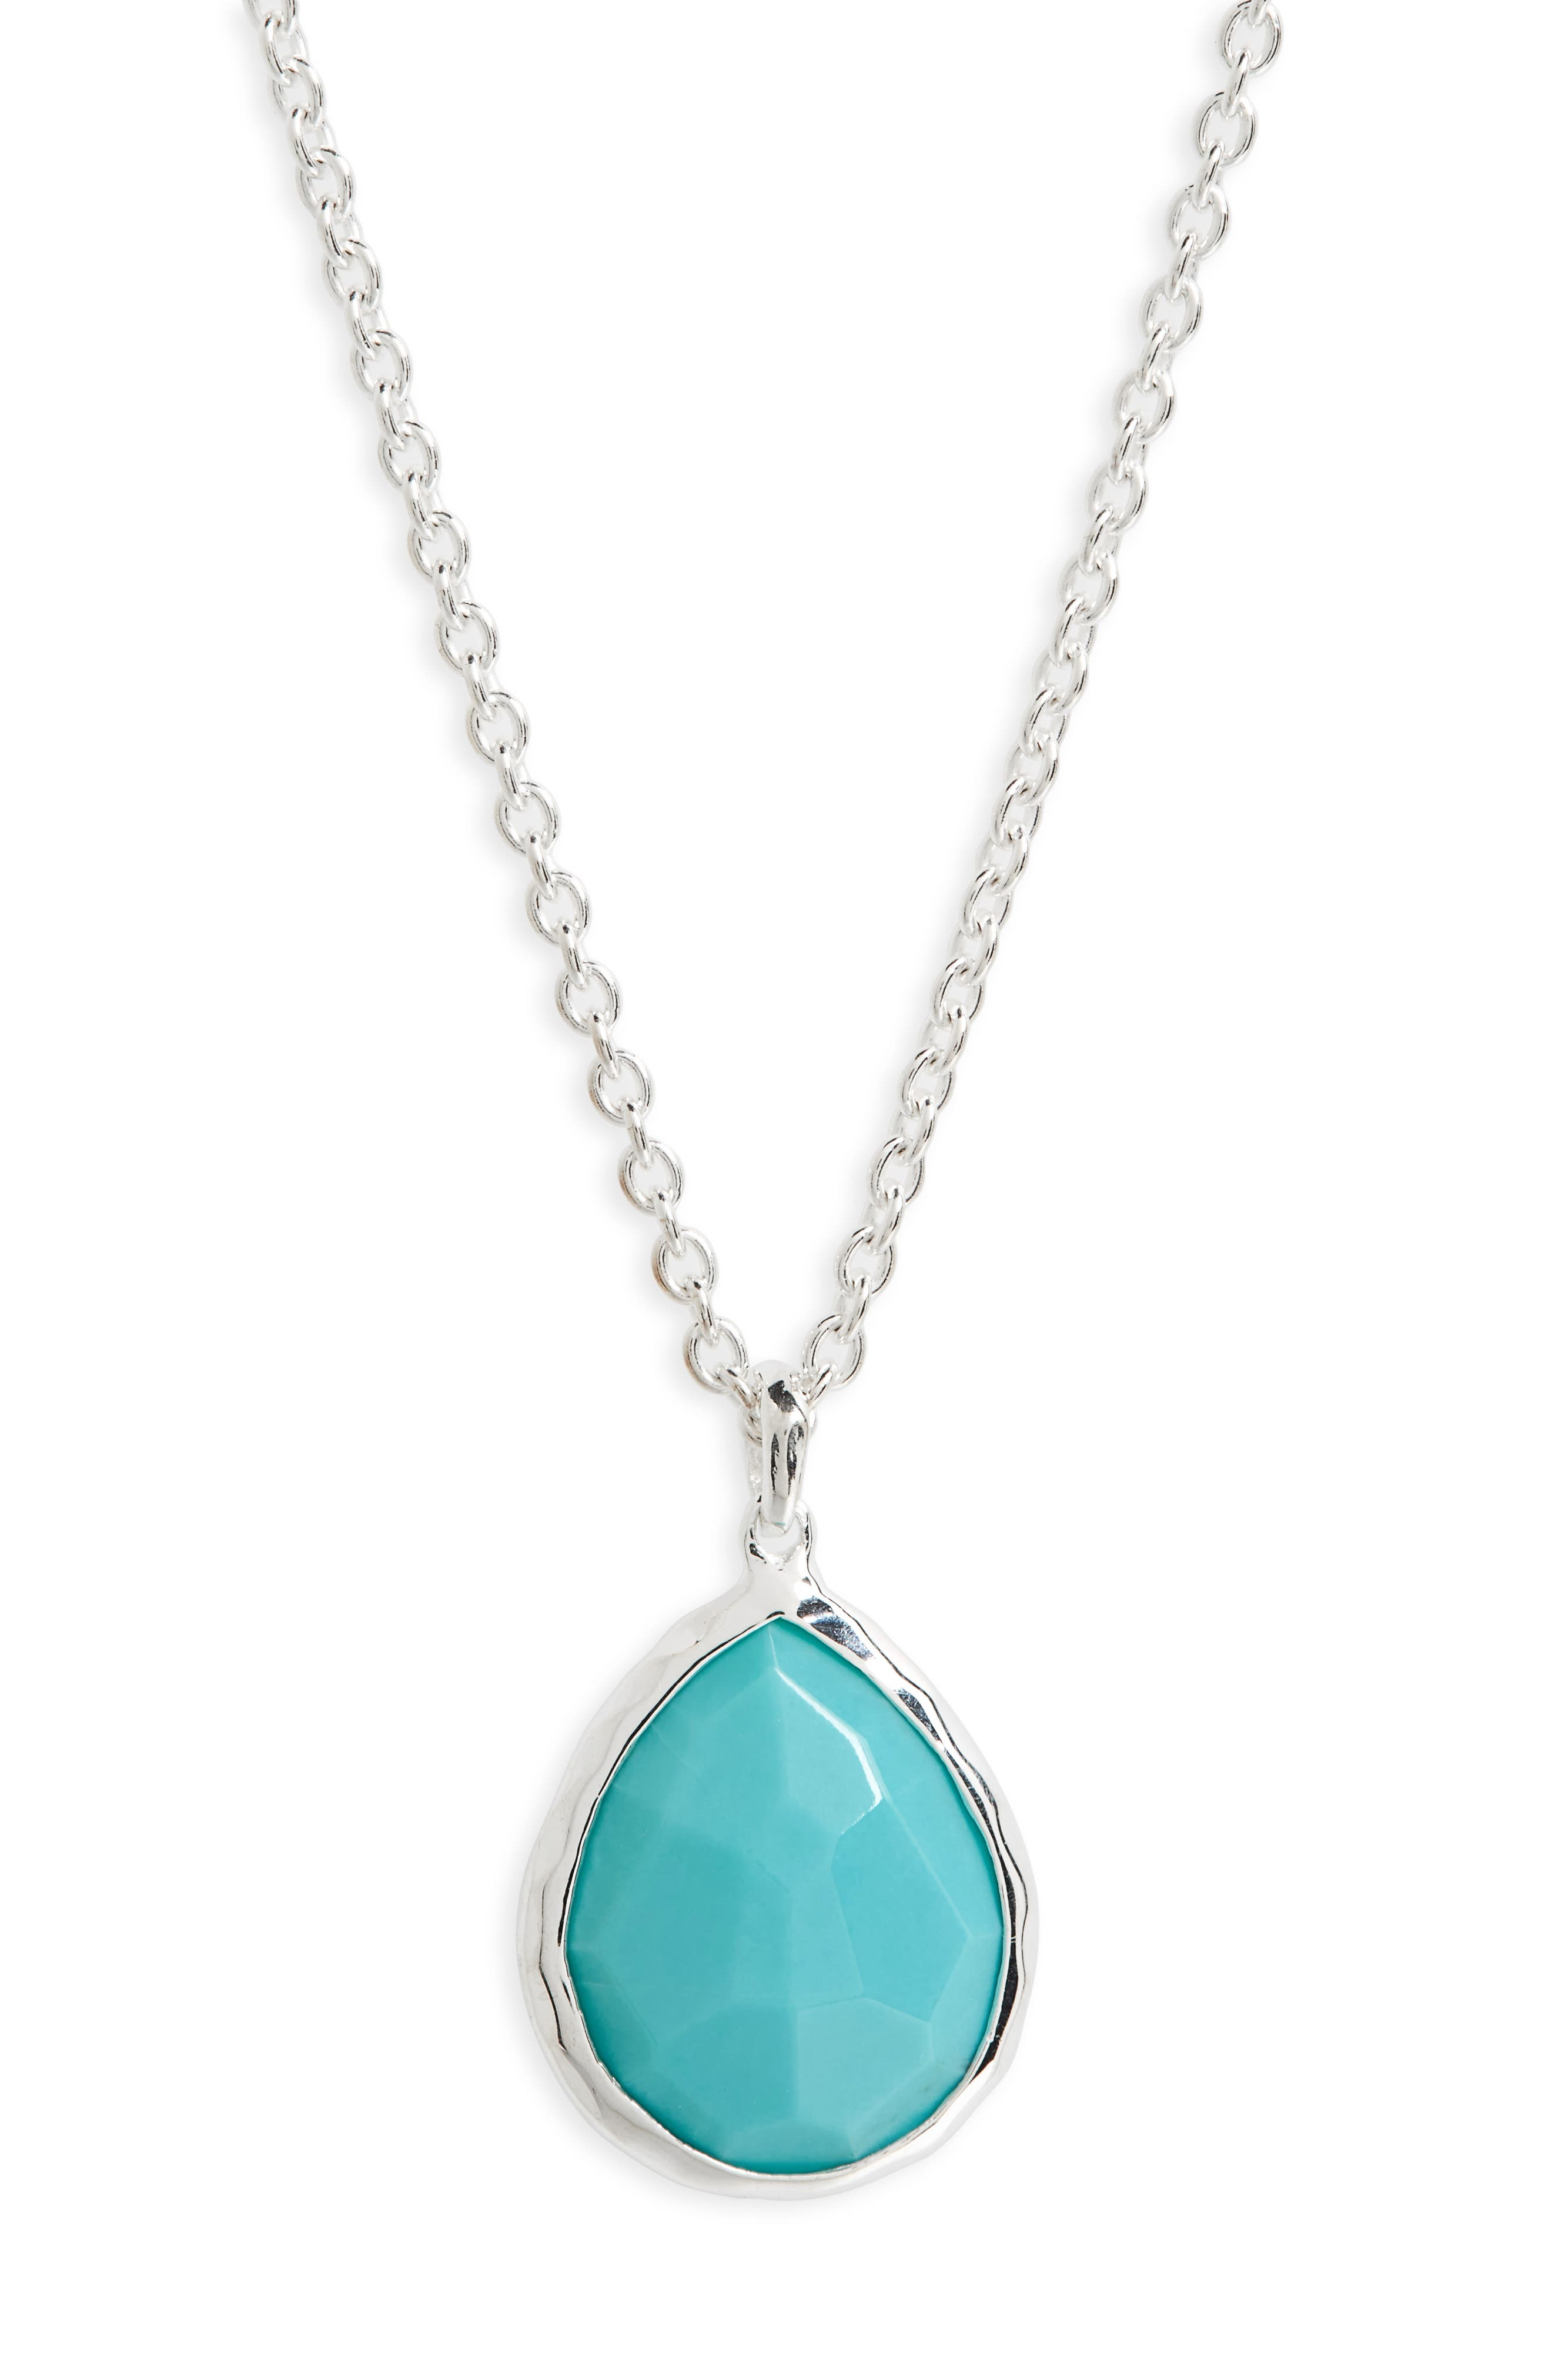 Alternate Image 1 Selected - Ippolita 'Wonderland' Mini Teardrop Pendant Necklace (Online Only)